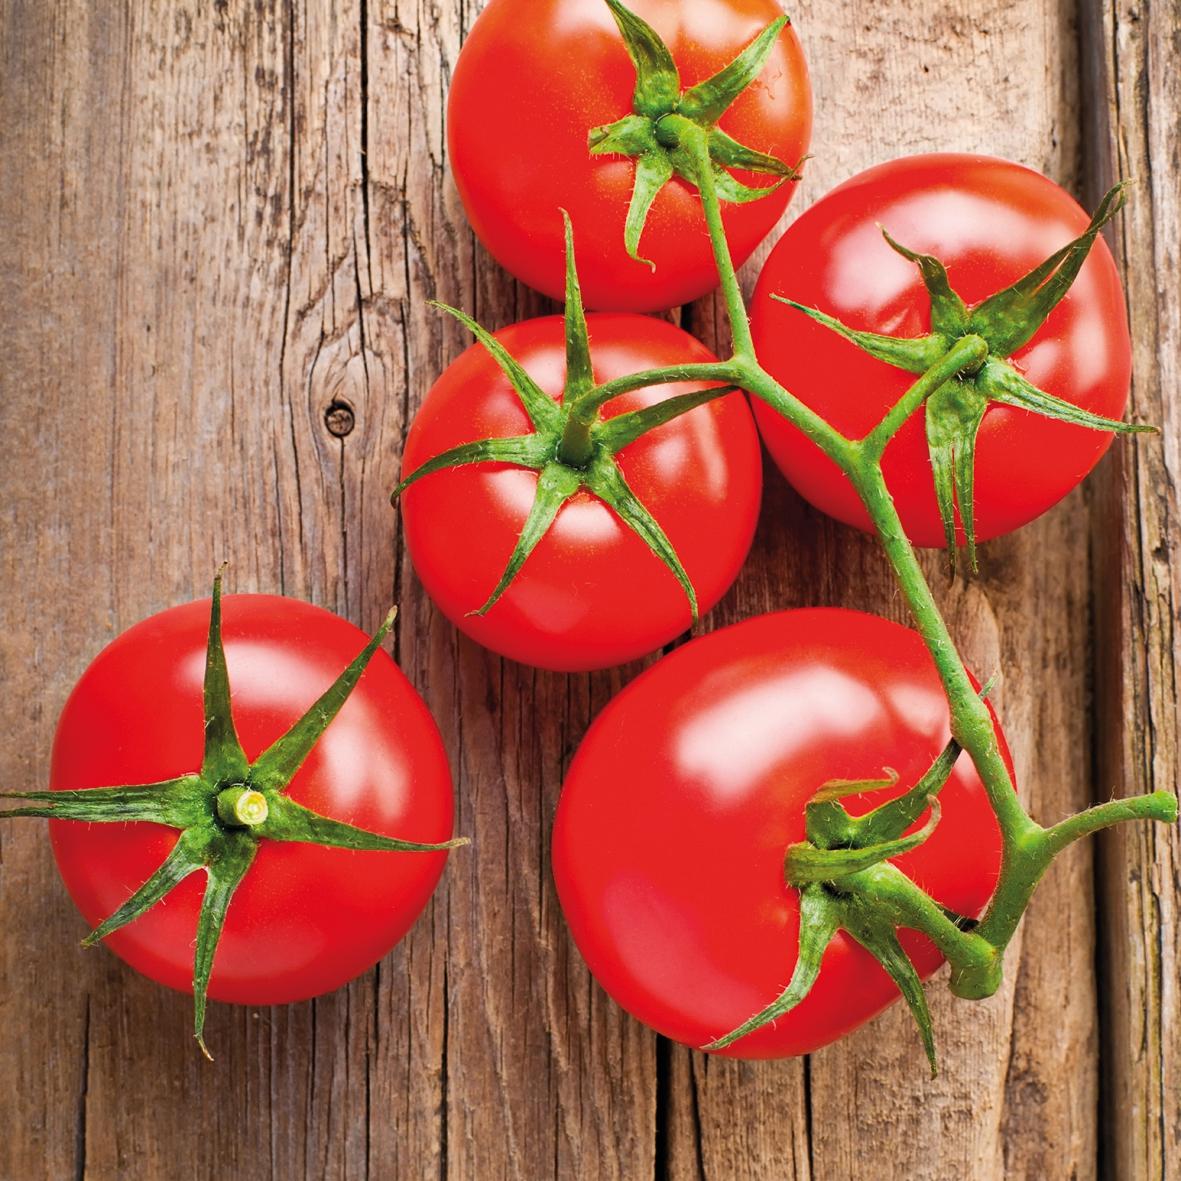 Lunch Servietten Tomato on Wood,  Gemüse - Tomaten,  Everyday,  lunchservietten,  Tomaten